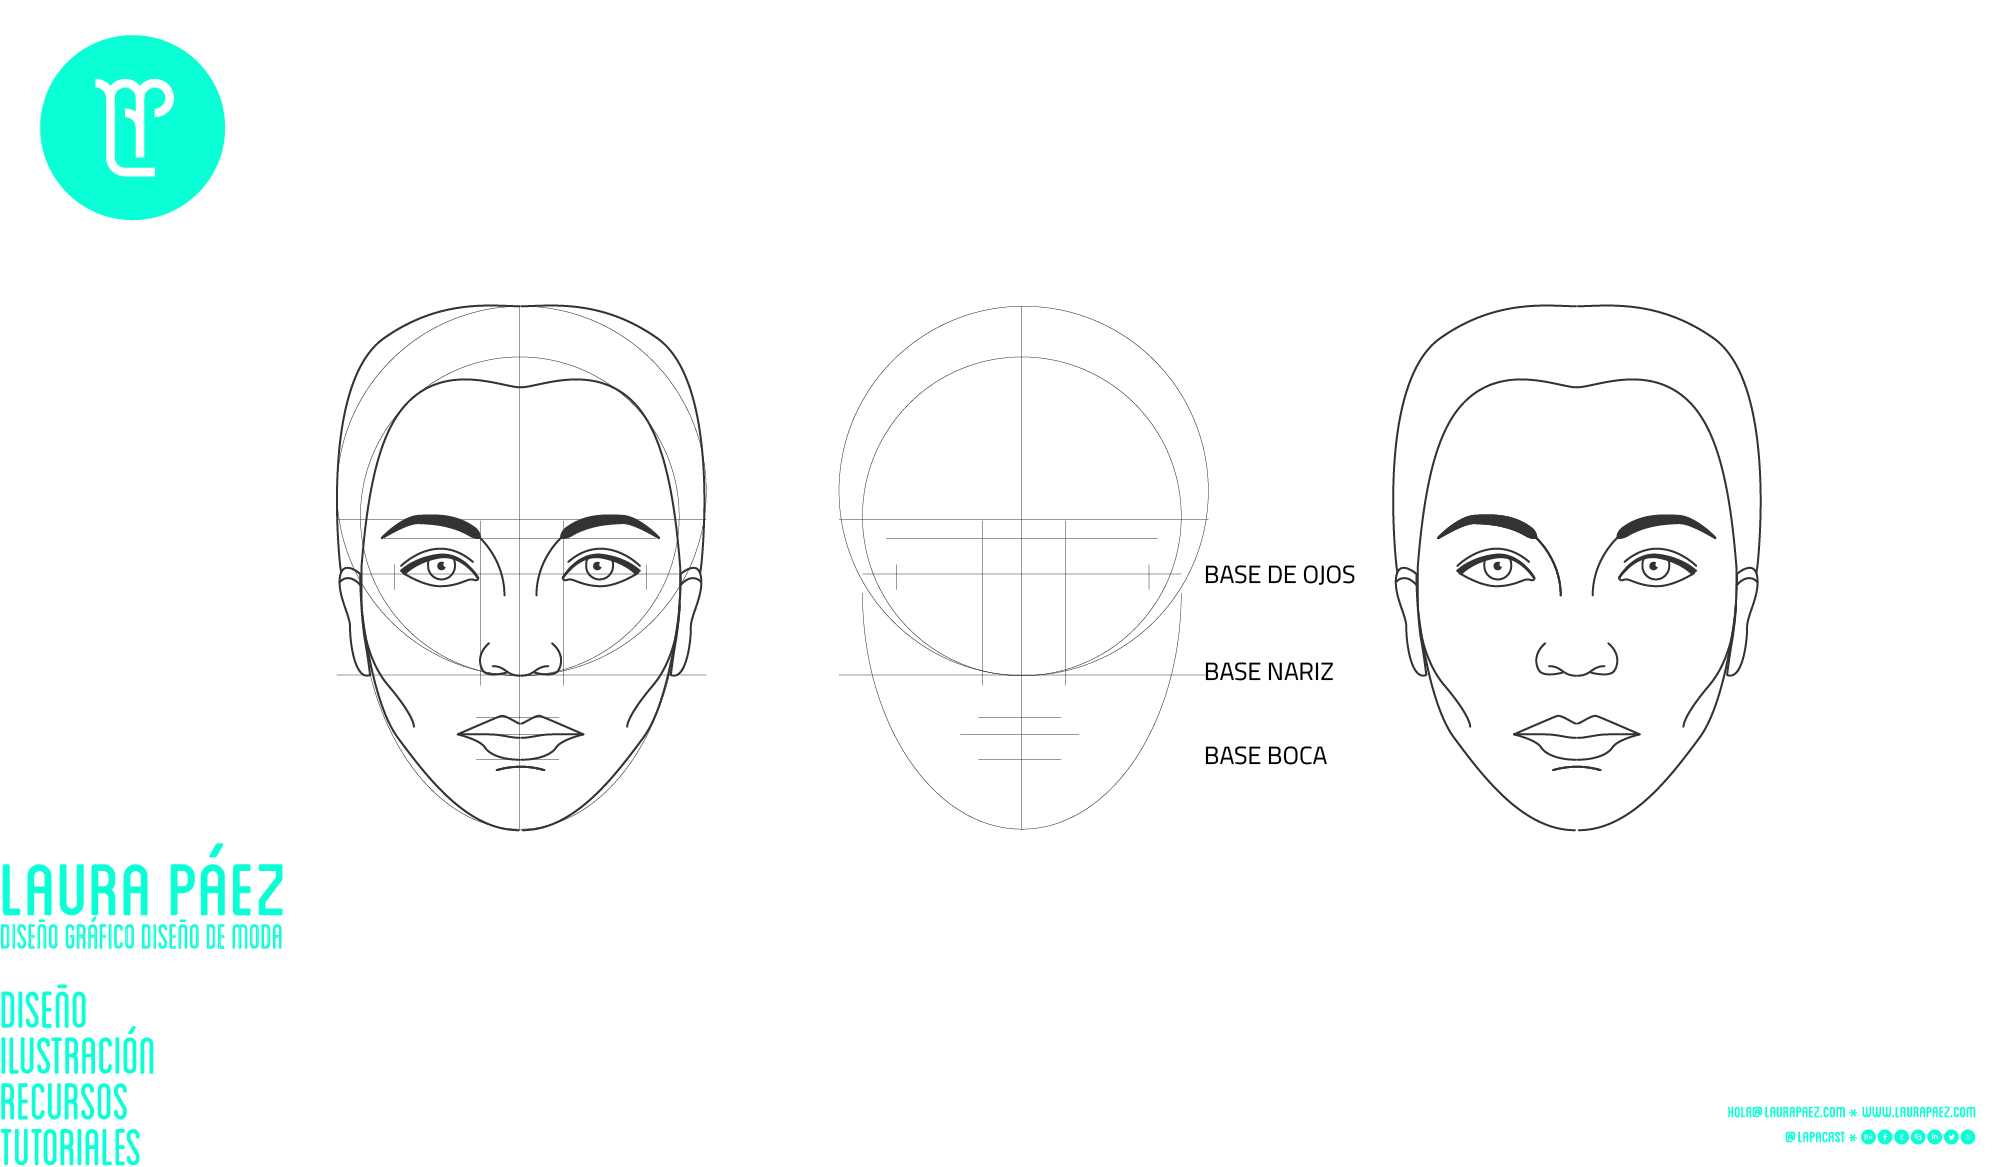 Descarga plantilla para dibujar caras - Laura Páez